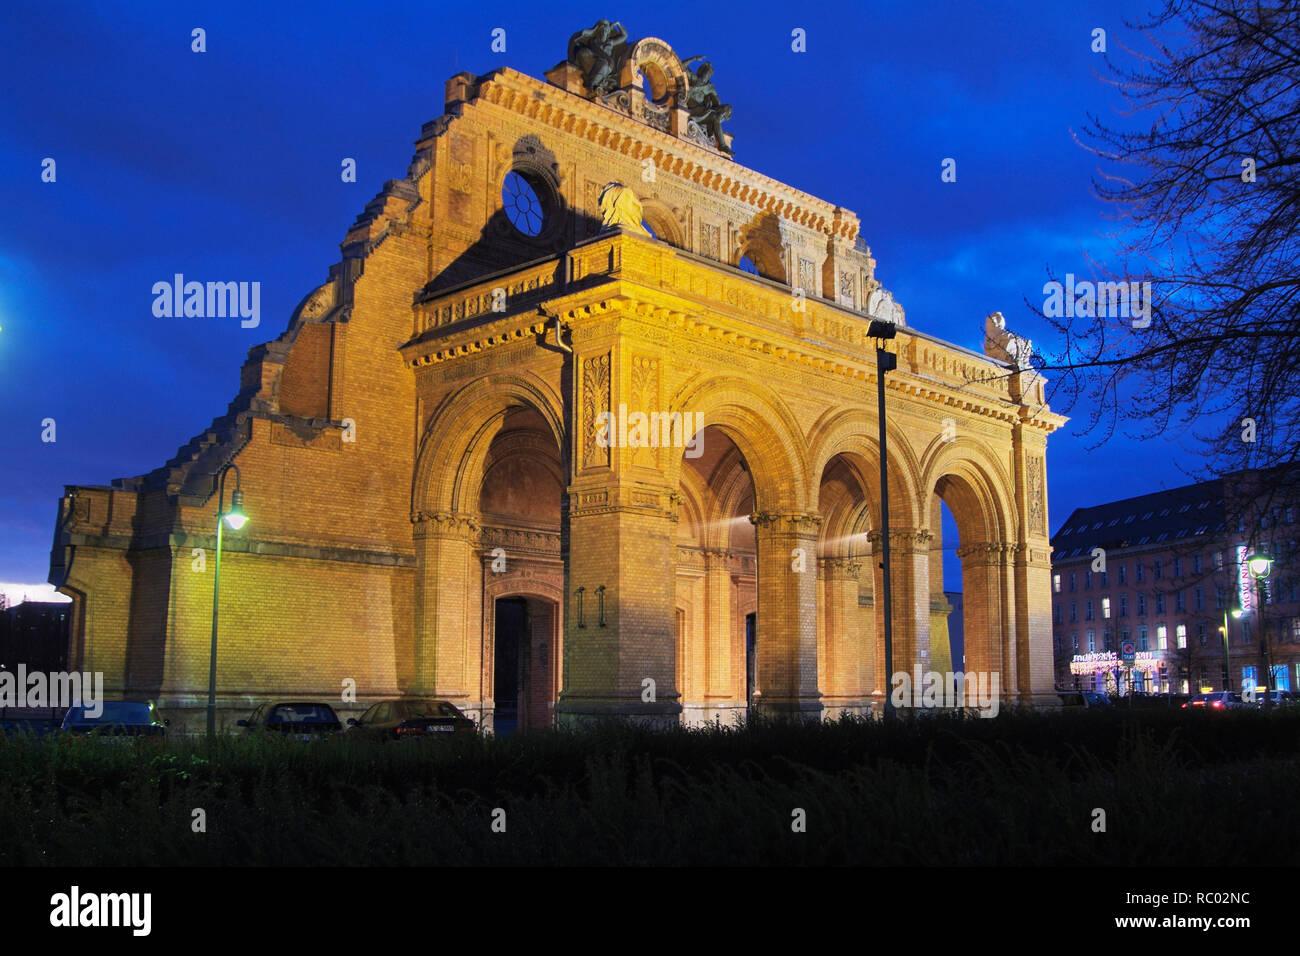 Portalruine Anhalter Bahnhof am Askanischen Platz, HG Tempodrom, Nähe Potsdamer Platz, Berlin-Kreuzberg, Deutschland, Europa | ruin Anhalt station, An - Stock Image